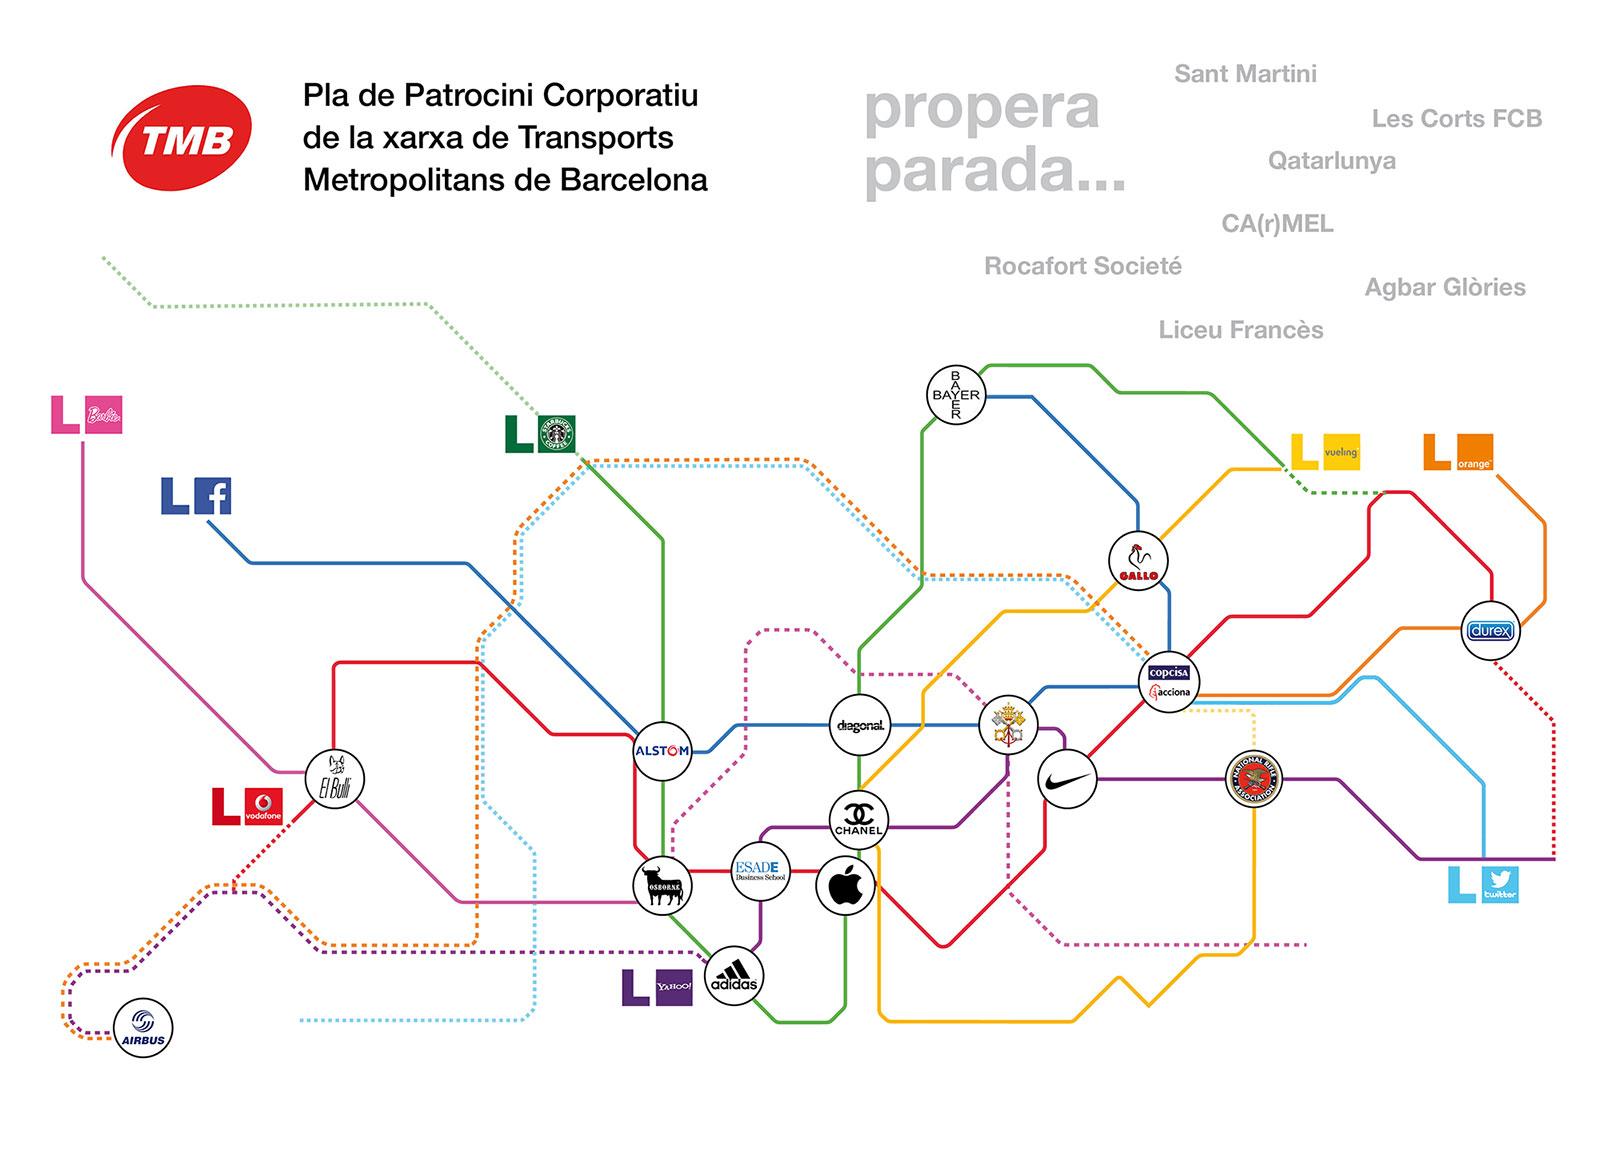 revista diagonal 35 - Desviacions: Patrocini corporatiu metro Barcelona